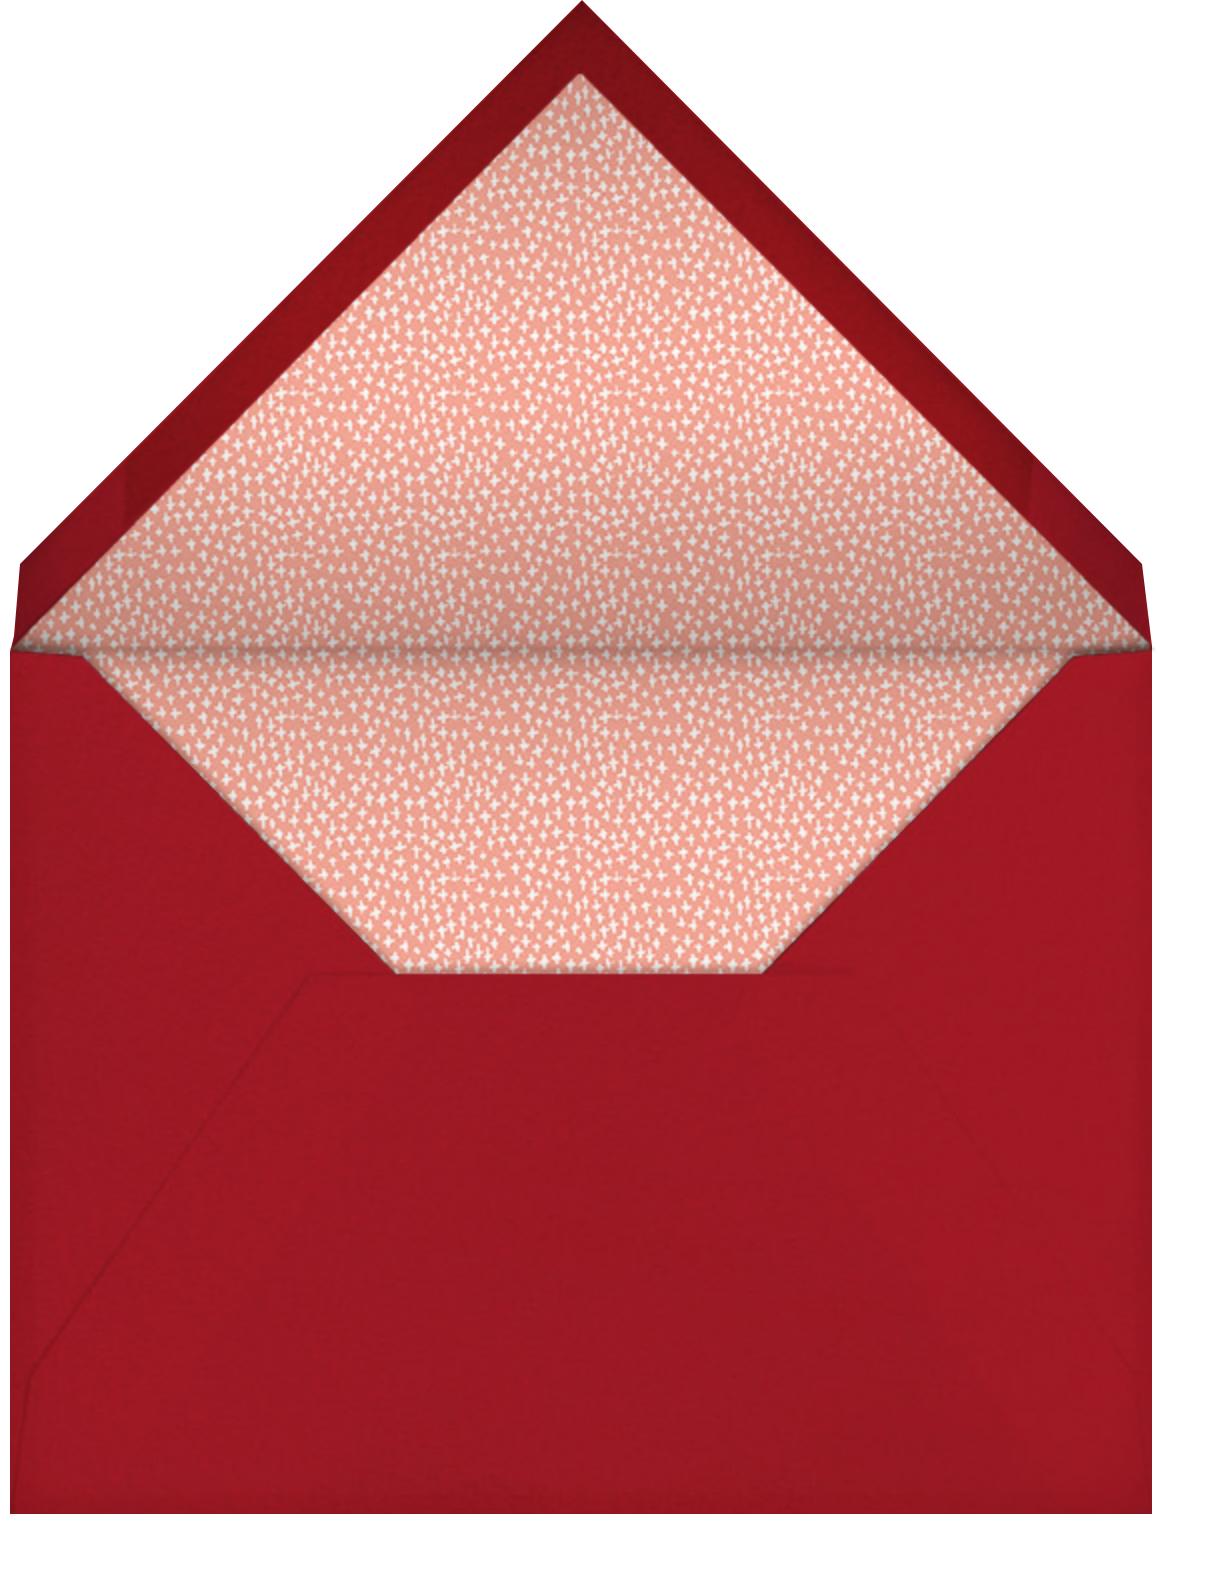 The House is Open - Mr. Boddington's Studio - Christmas party - envelope back